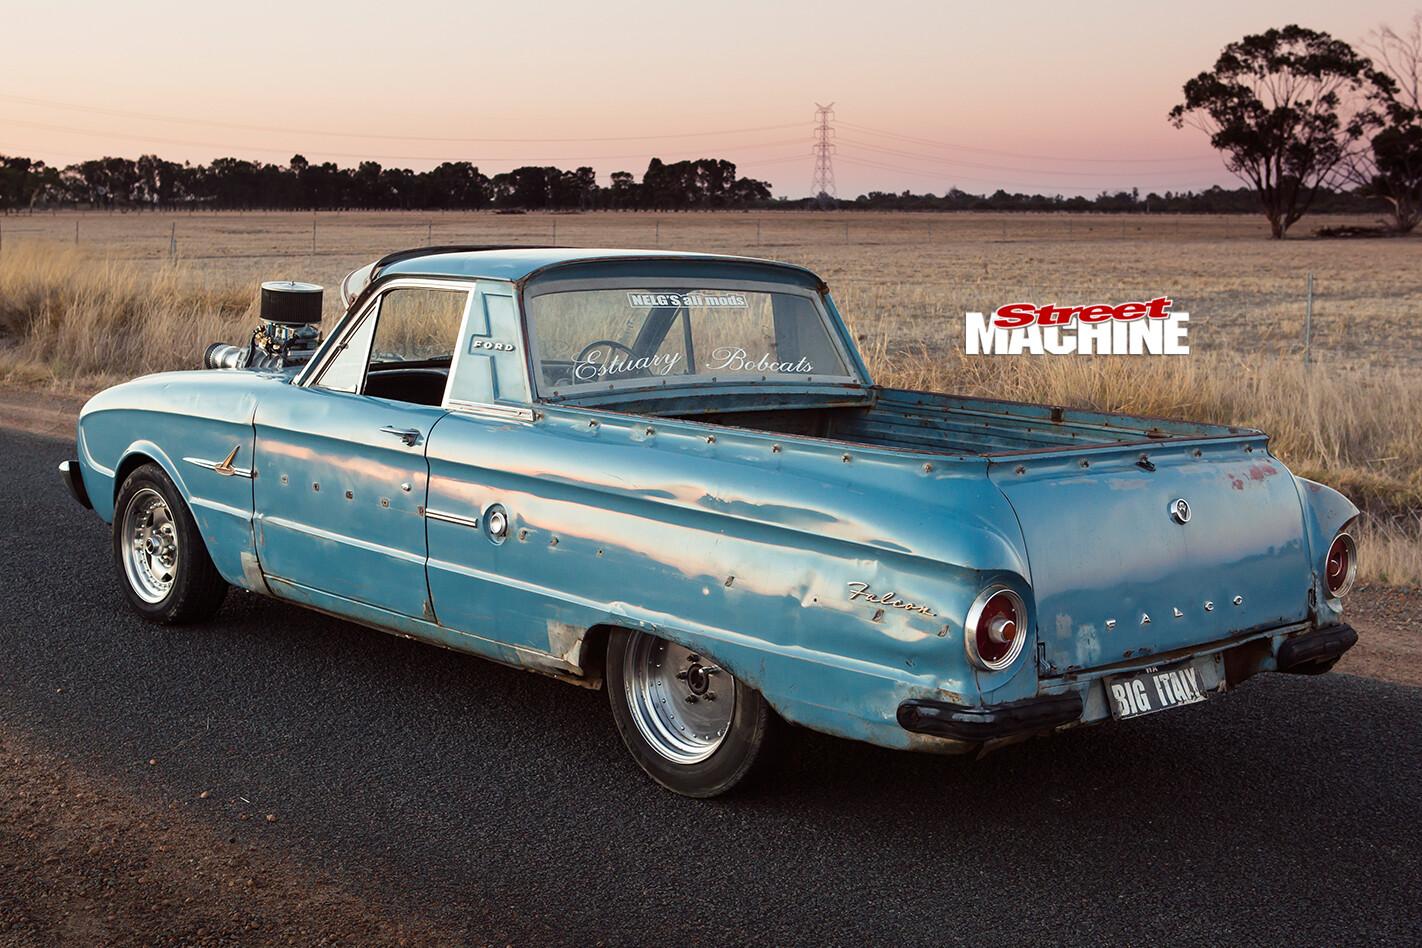 Ford -xl -falcon -ute -rear -view